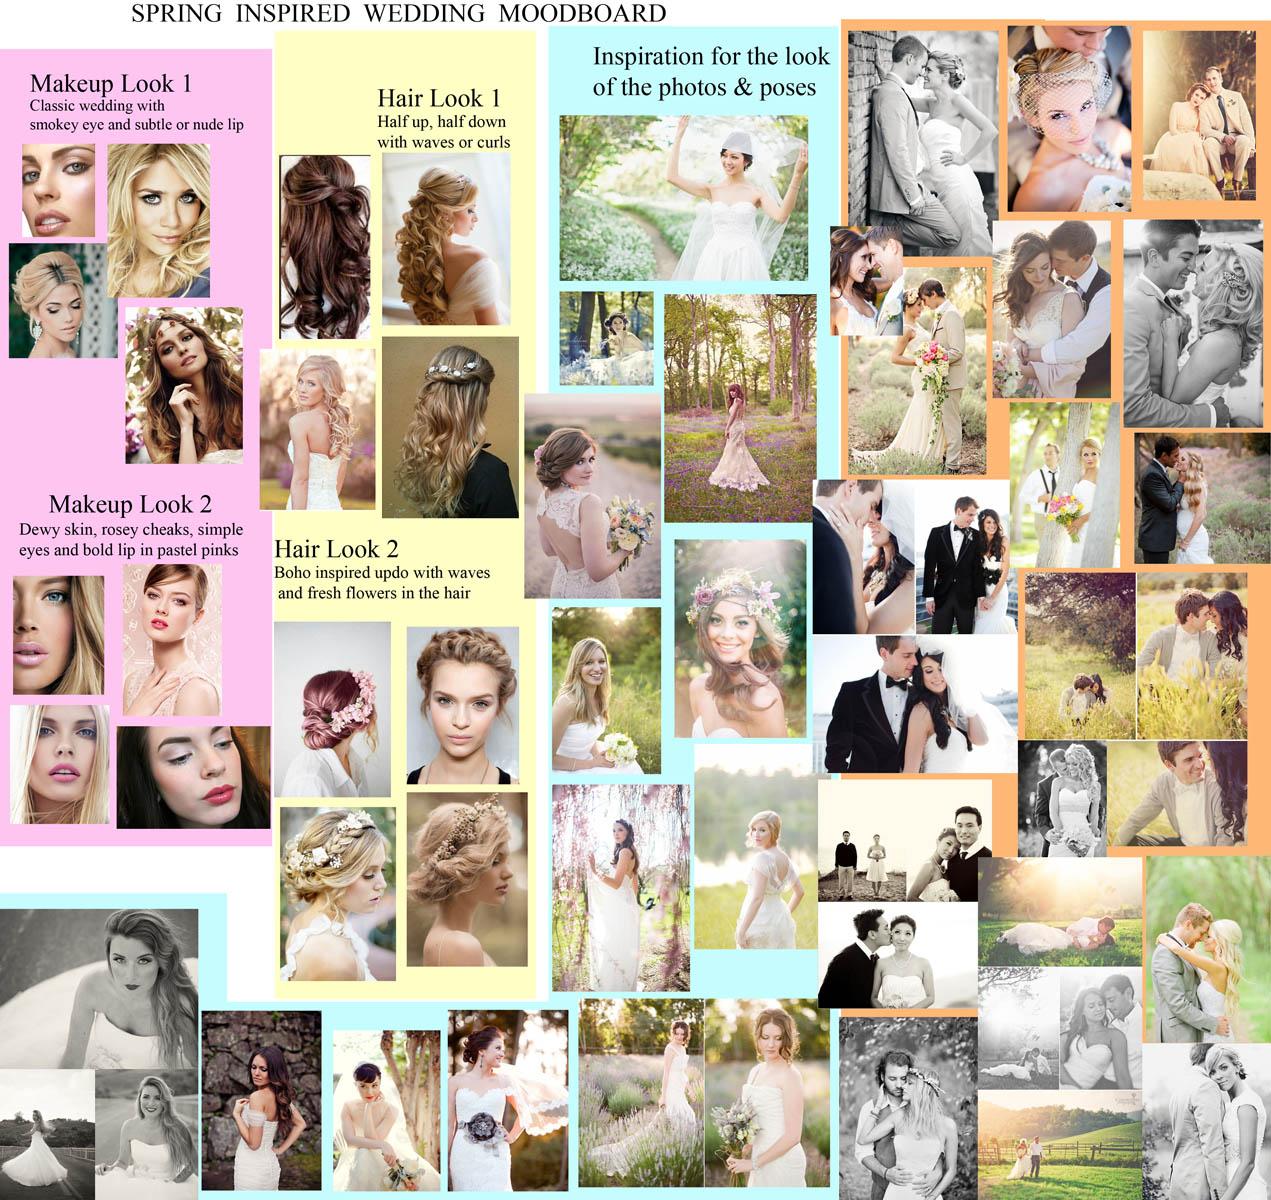 spring moodboard for wedding photoshoot